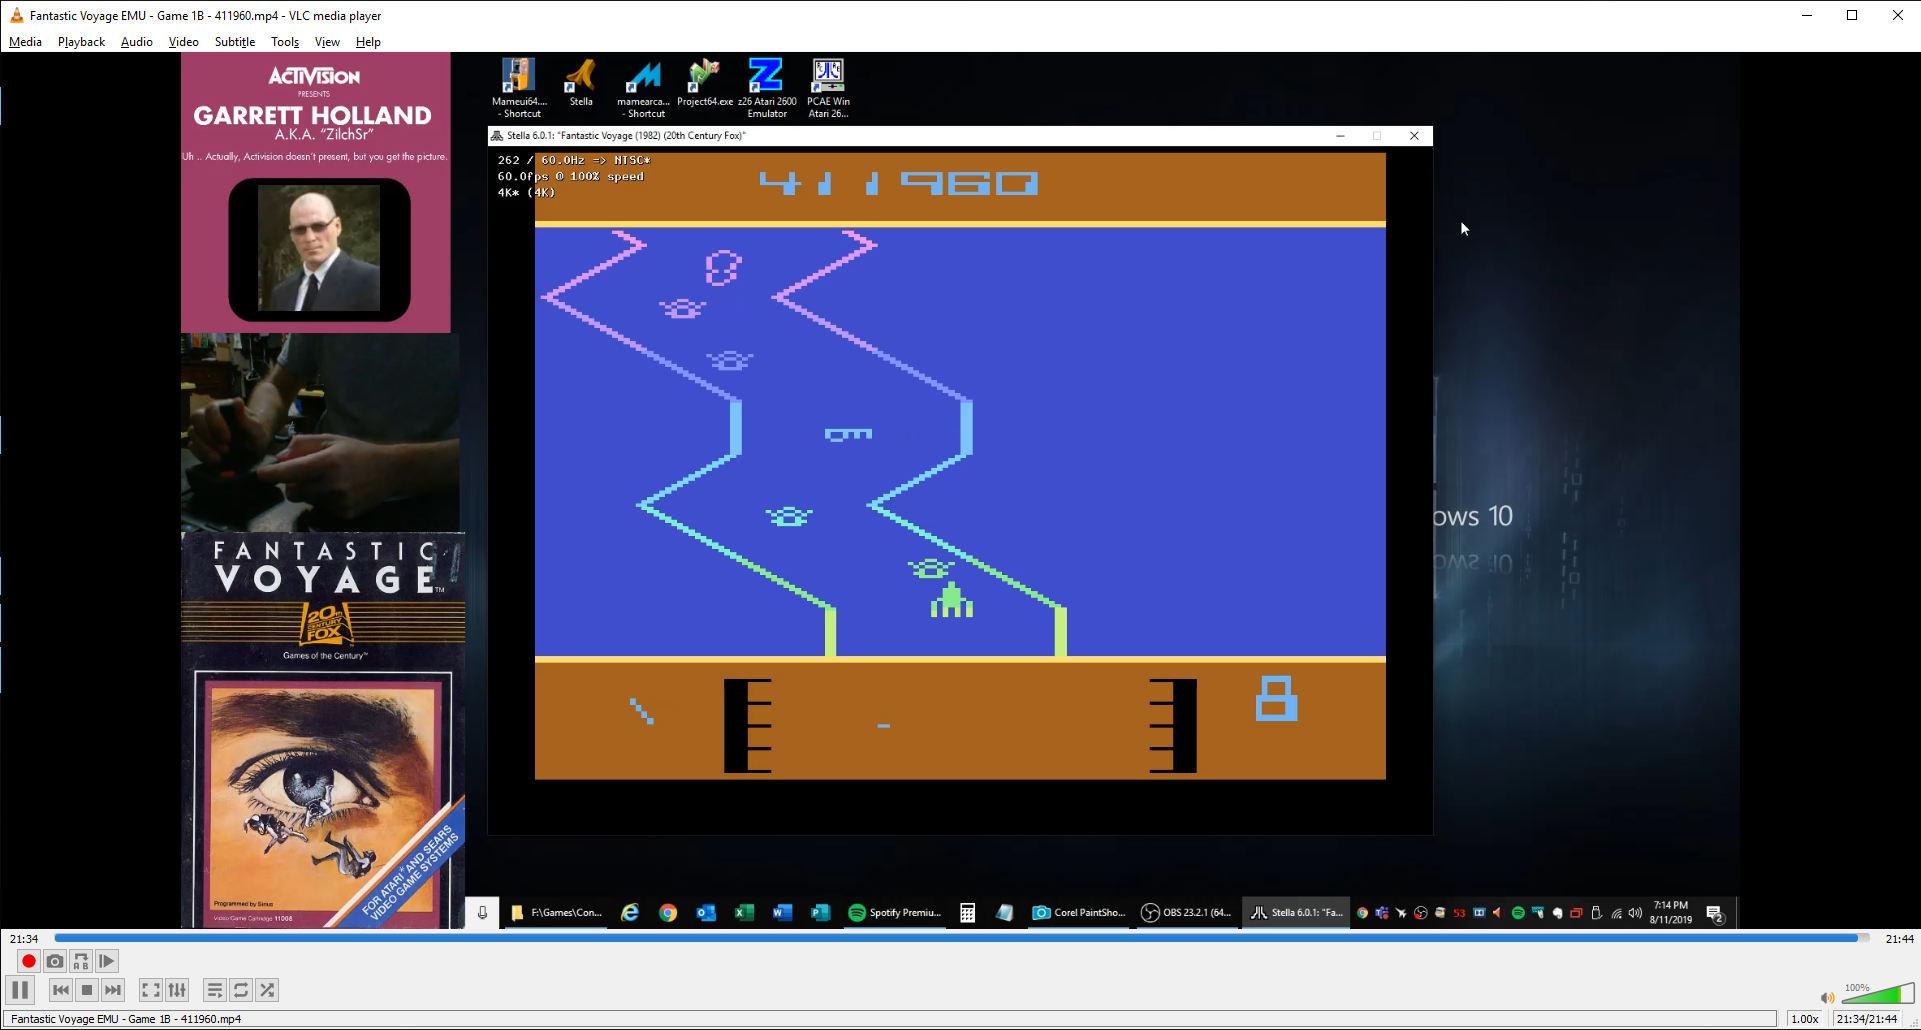 ZilchSr: Fantastic Voyage (Atari 2600 Emulated) 411,960 points on 2019-08-11 18:20:57